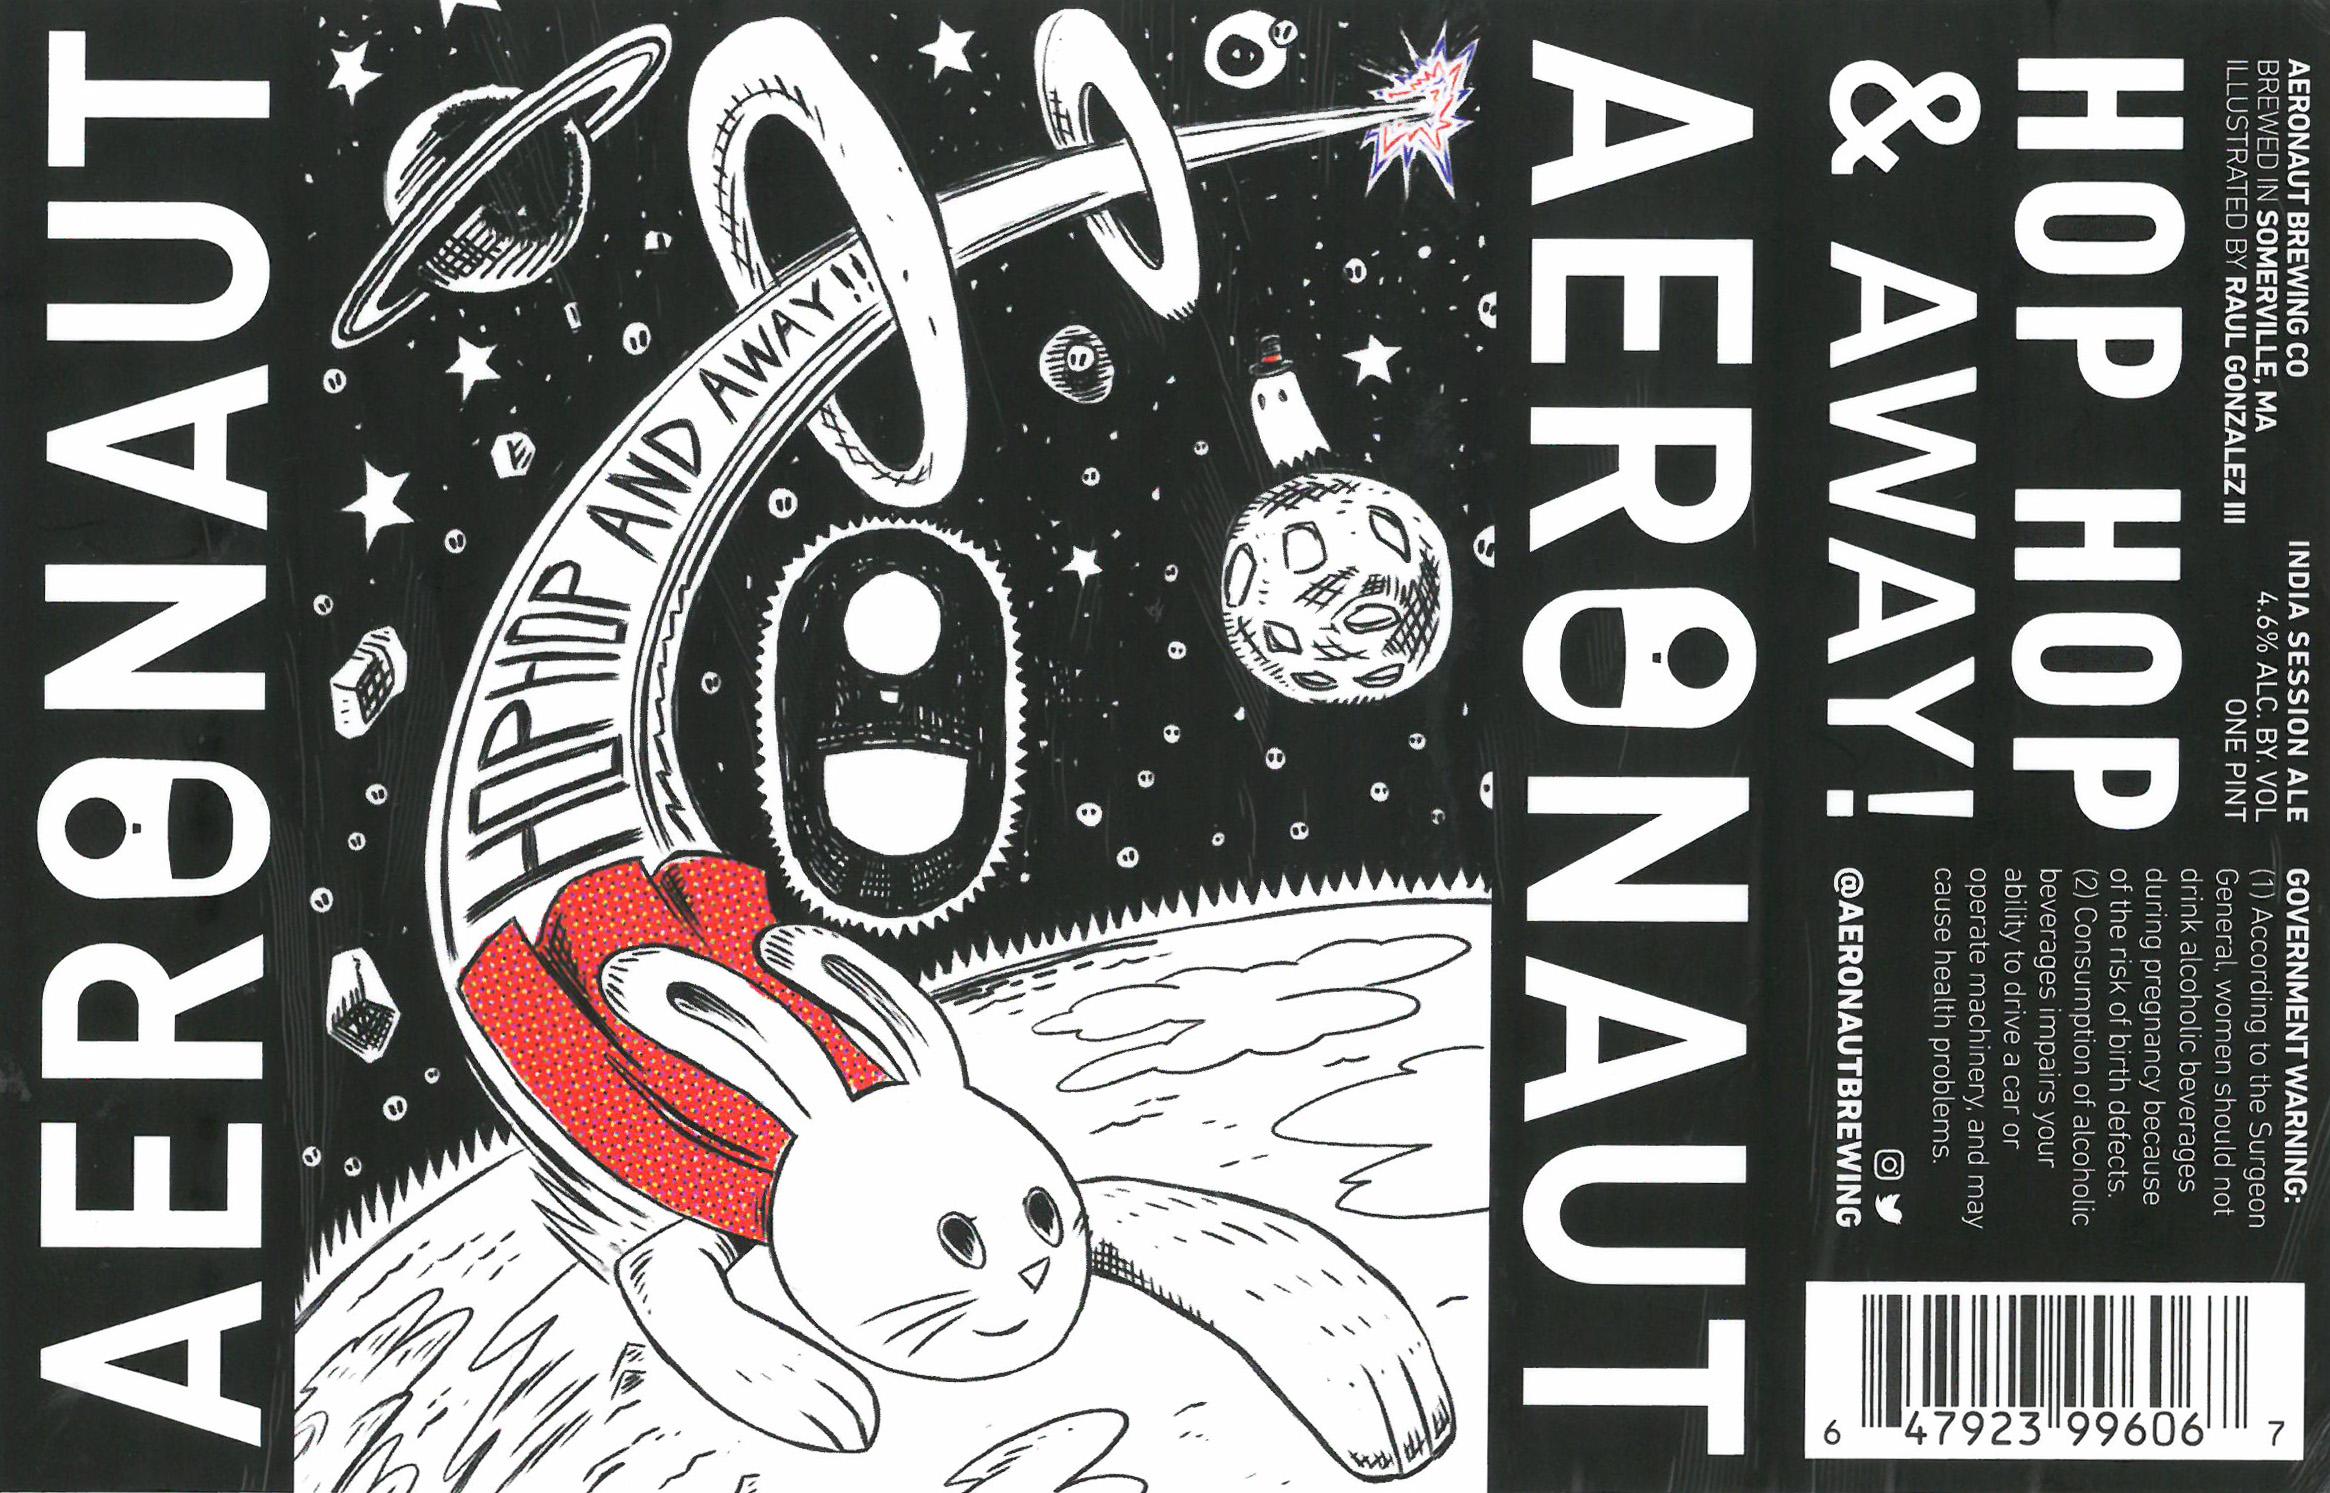 """Hop Hop & Away!"" label design by Raúl Gonzalez III and Aeronaut Brewing"